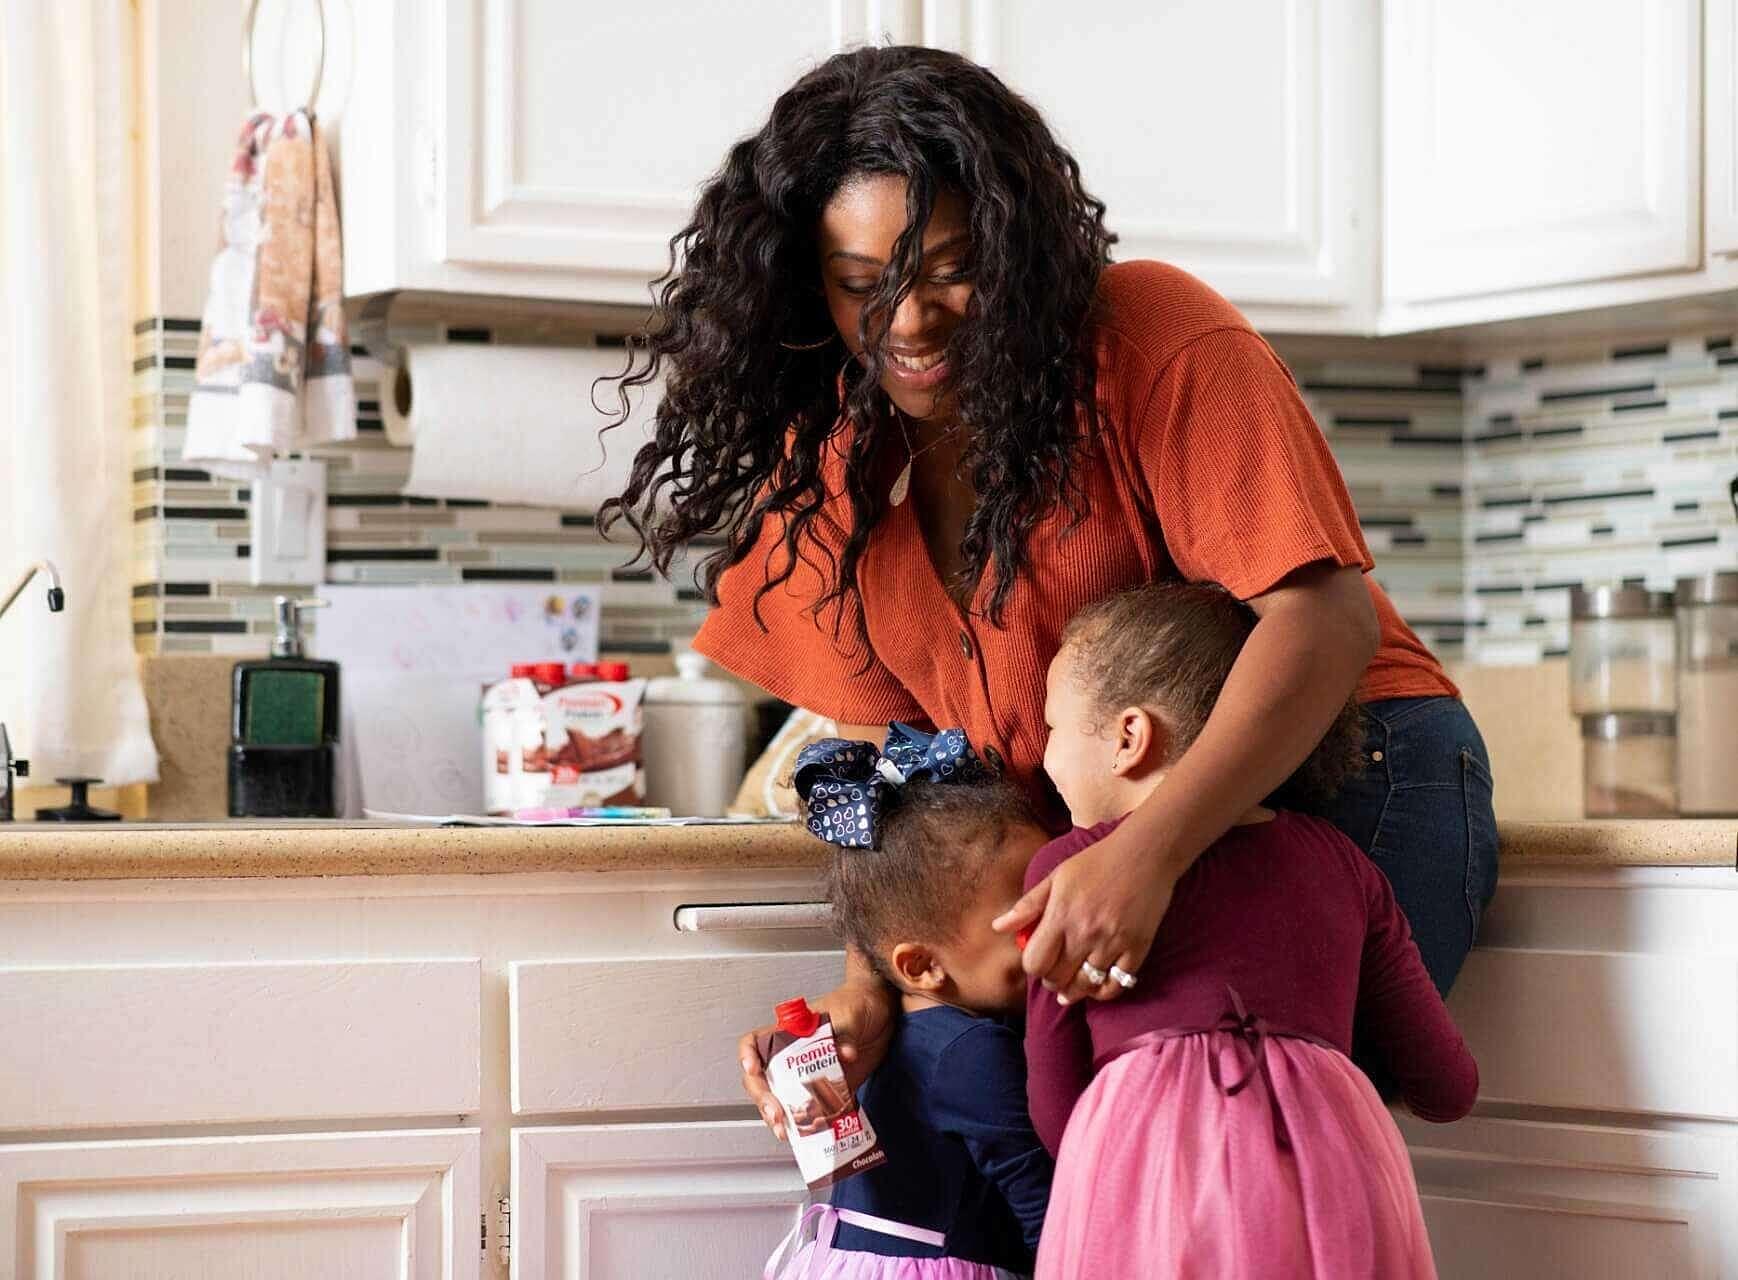 Charmaine in her kitchen with her children.